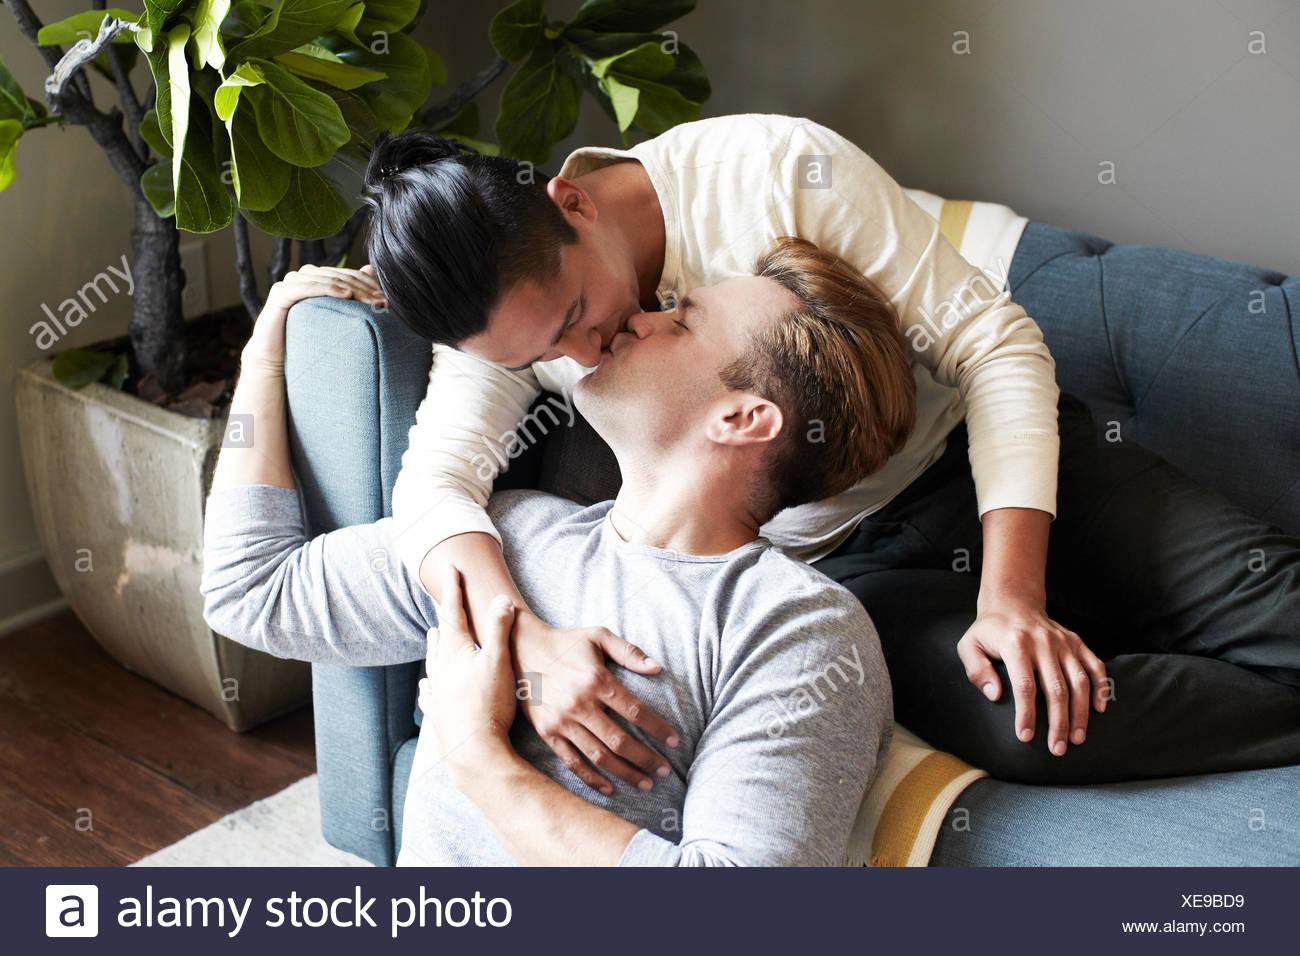 Coppia omosessuale kissing Immagini Stock